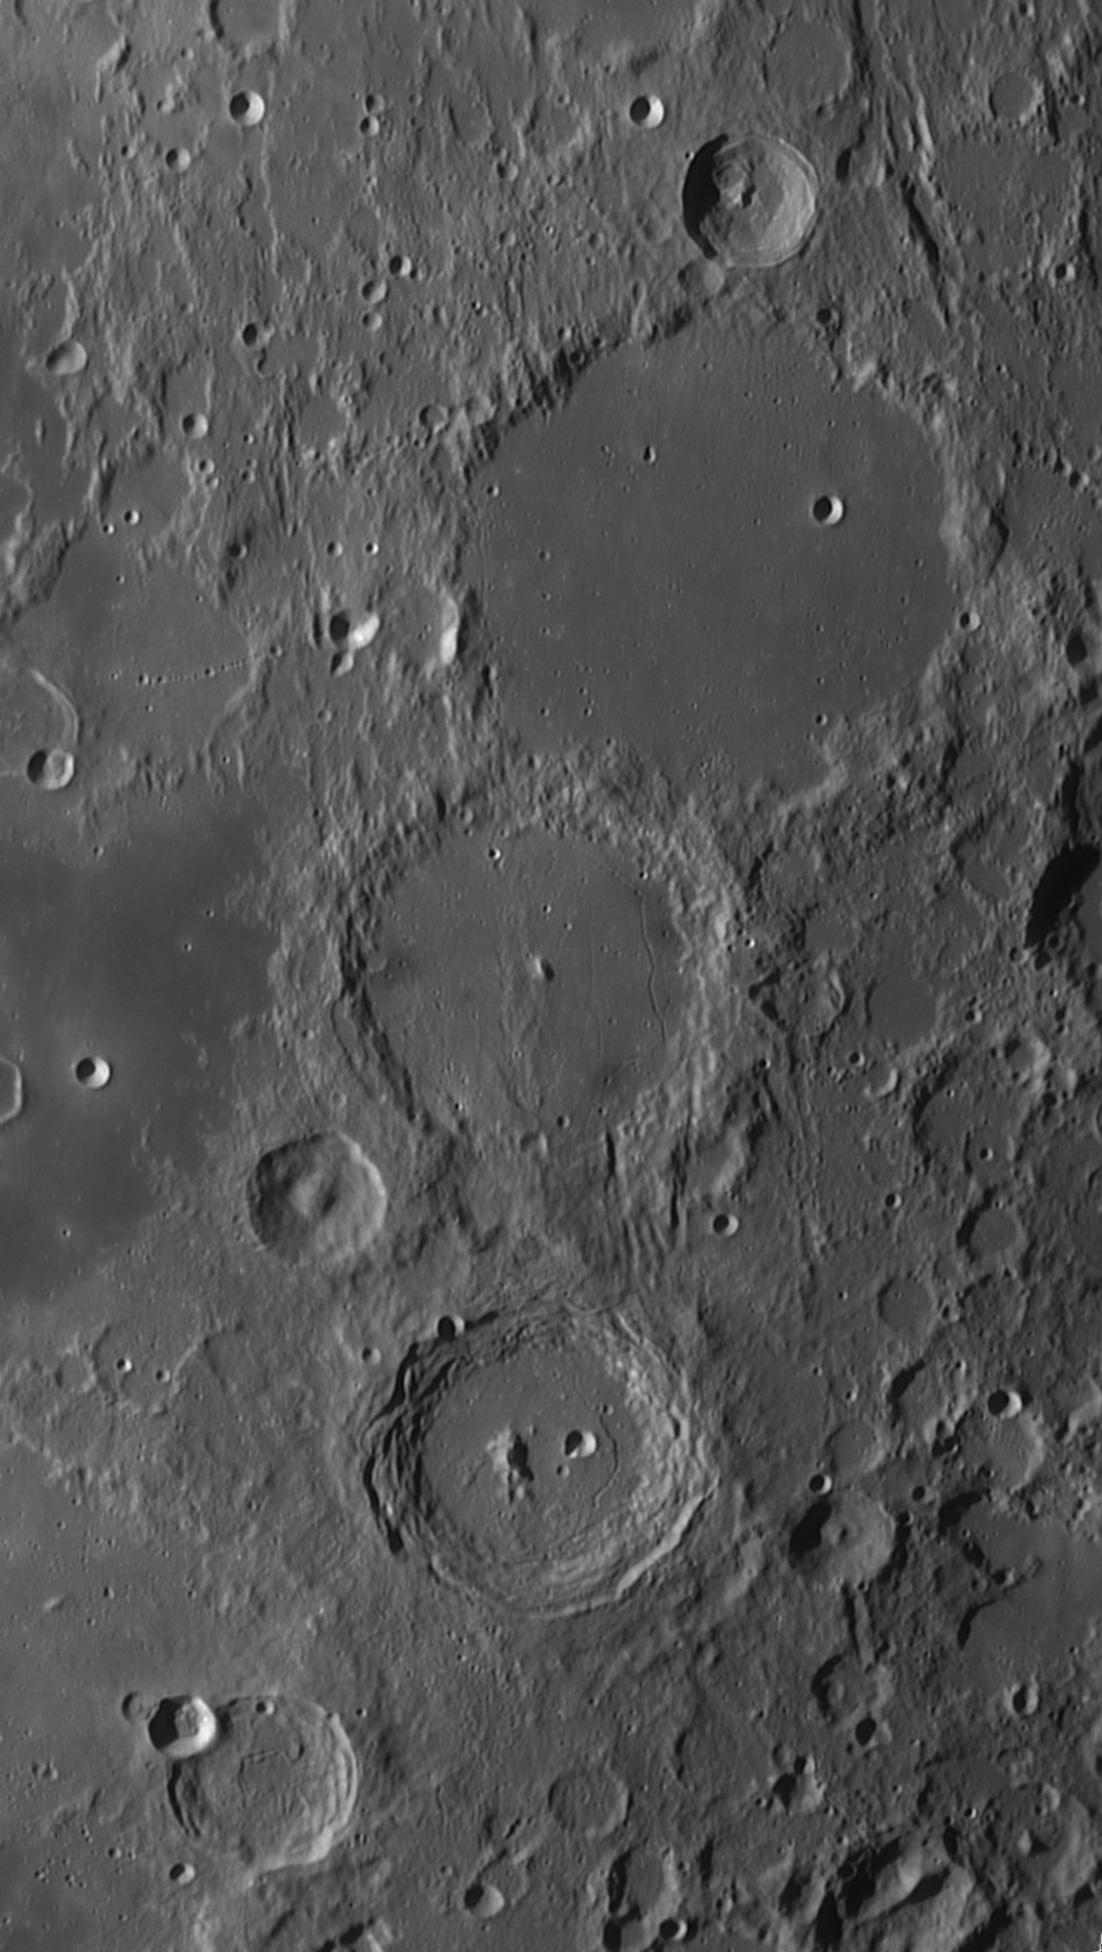 Alphonsus.jpg.157d37db757b6ef1dcaf0f4cc3aae627.jpg